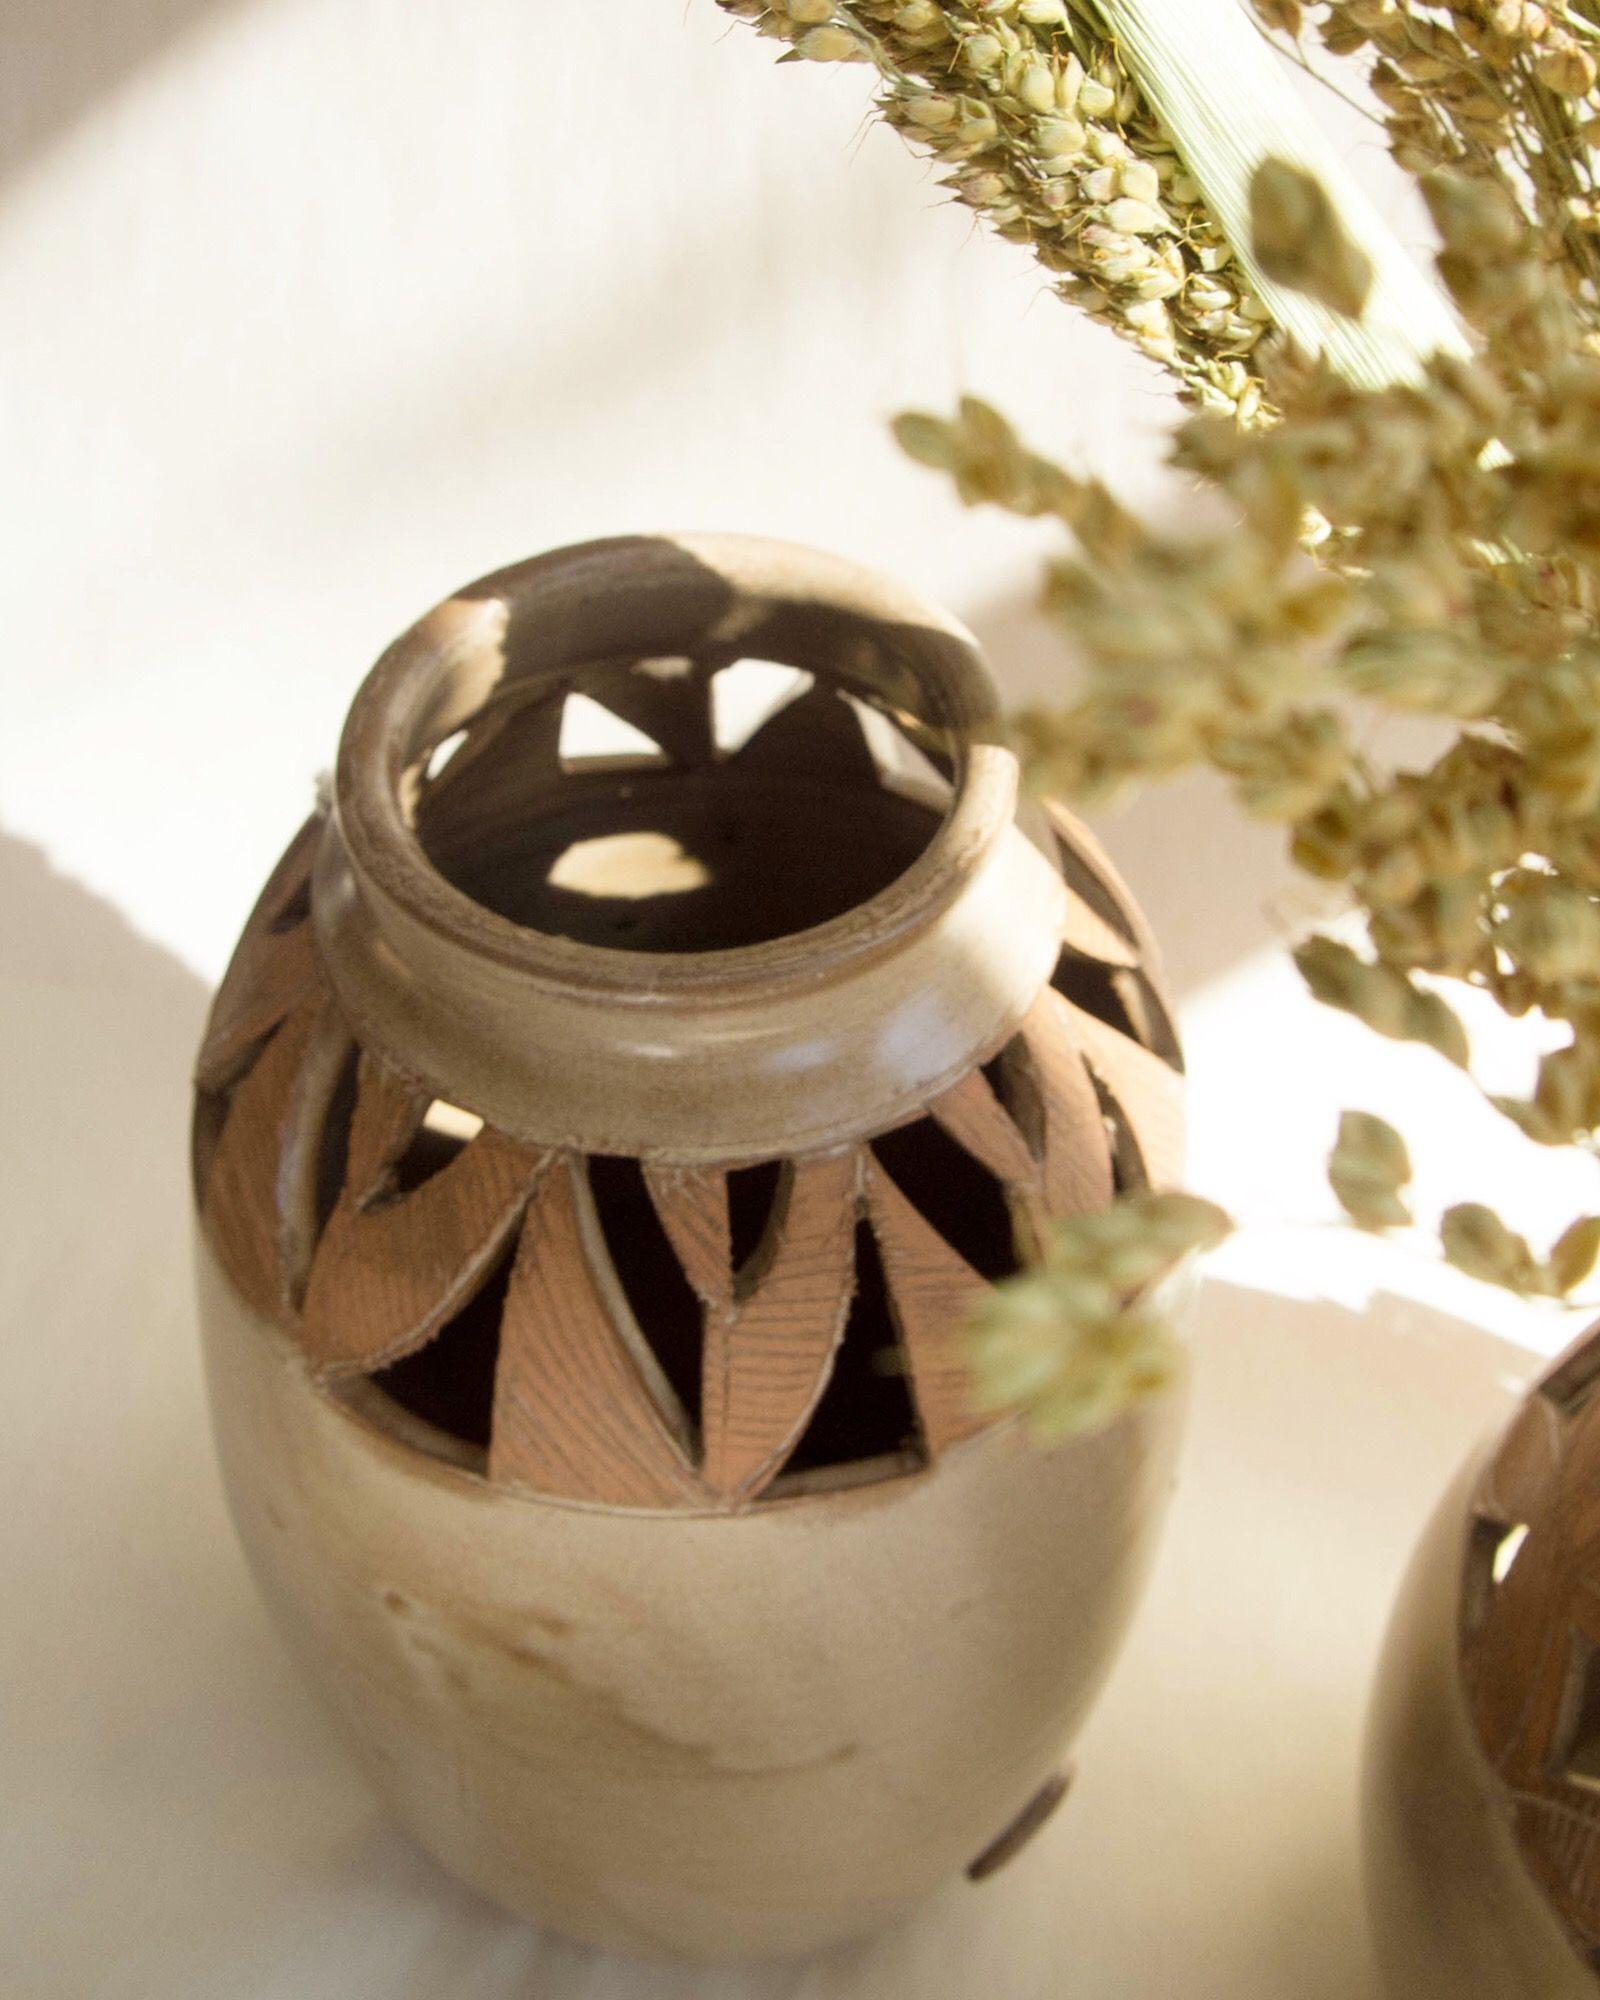 #contemporaryceramics #handcarved #modernpottery #rusticdecor #wheelthrown #stoneware